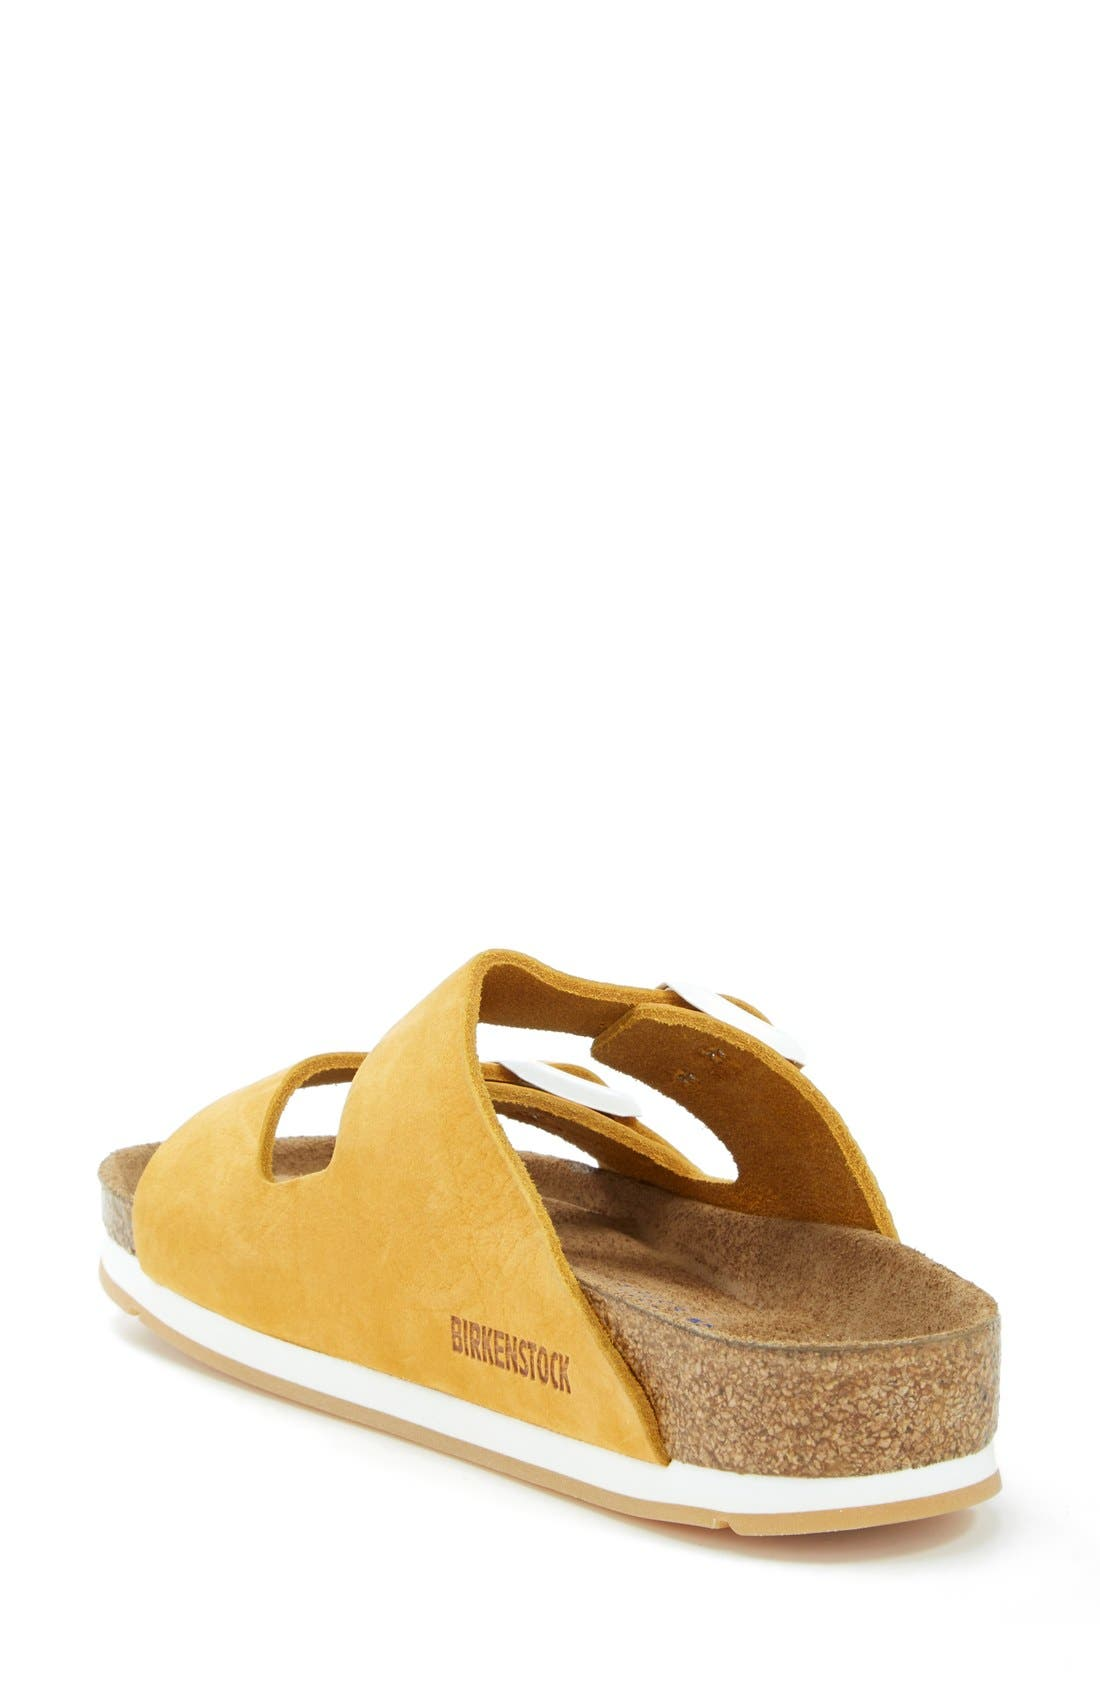 Alternate Image 2  - Birkenstock 'Arizona' Soft Footbed Sandal (Women)